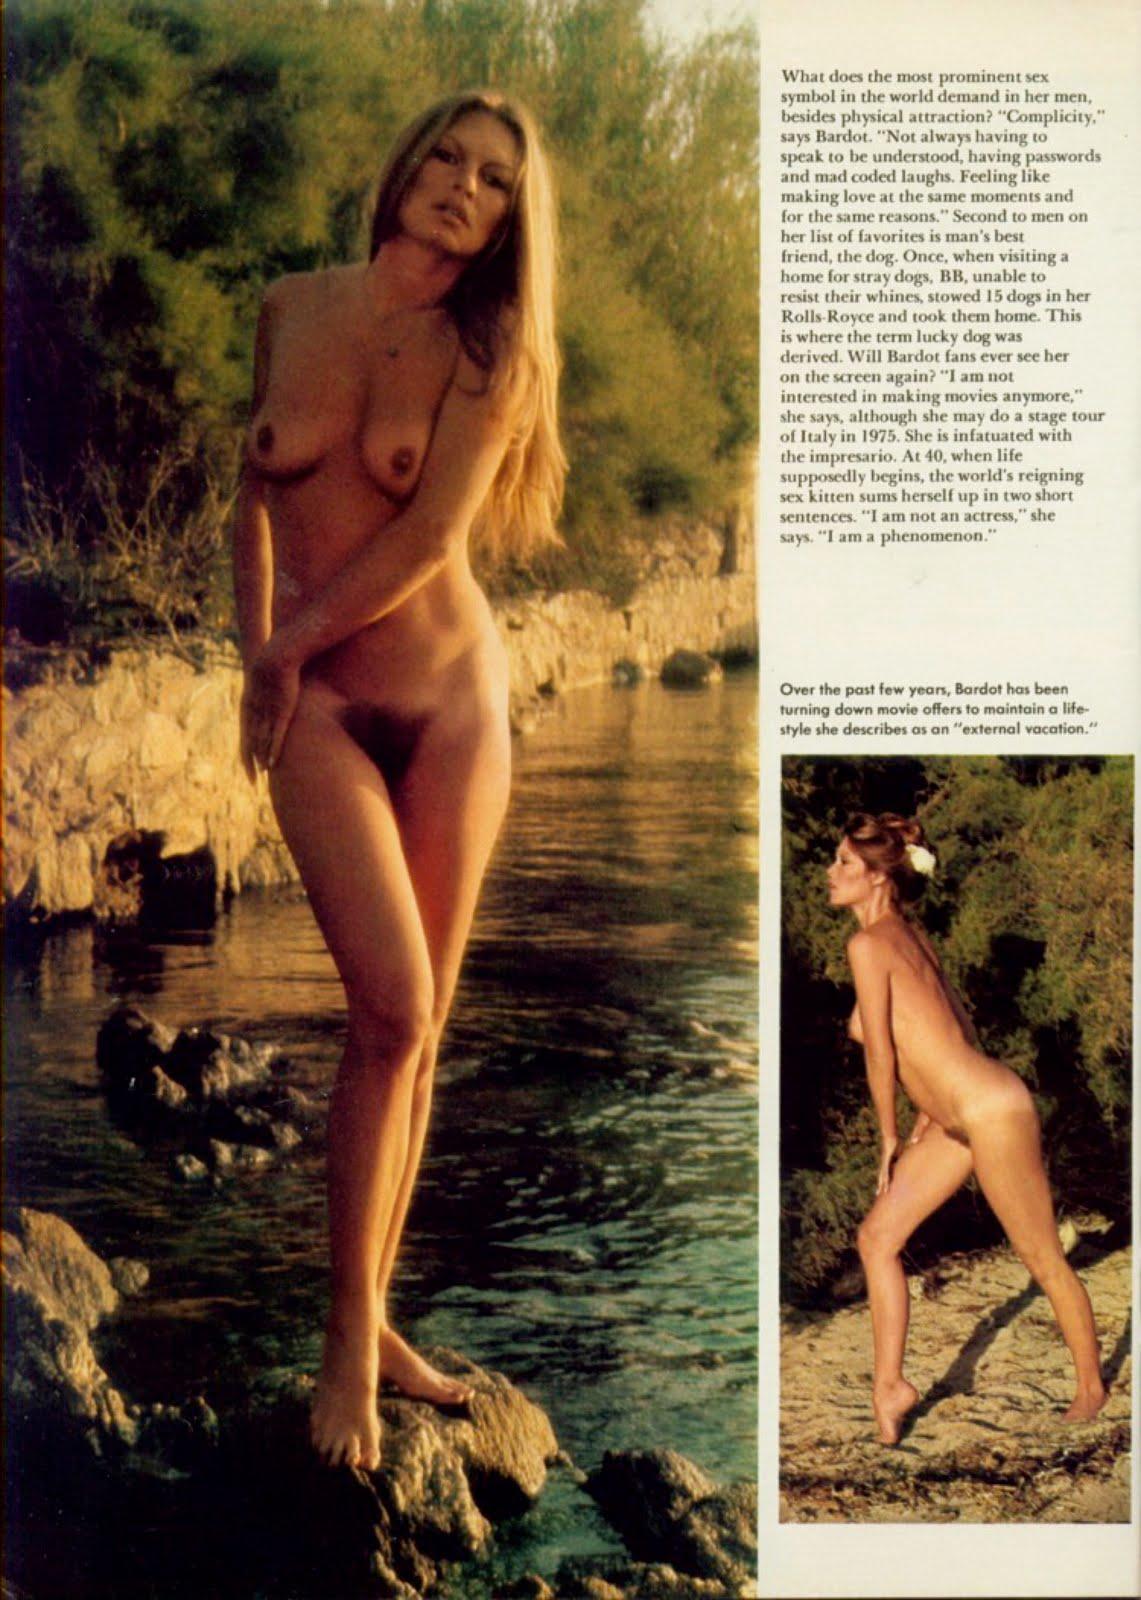 brigitte bardot nude Brigitte Bardot dans Playboy US (1975).